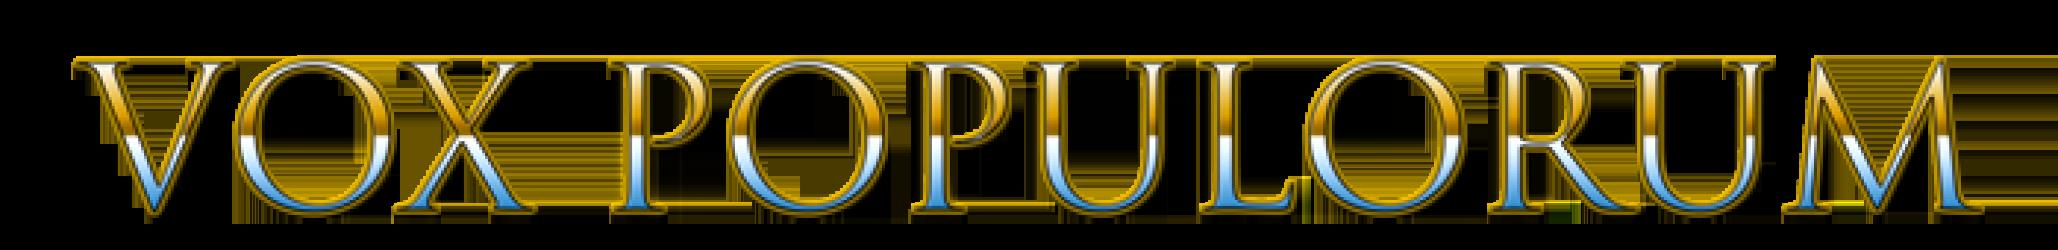 Vox Populorum